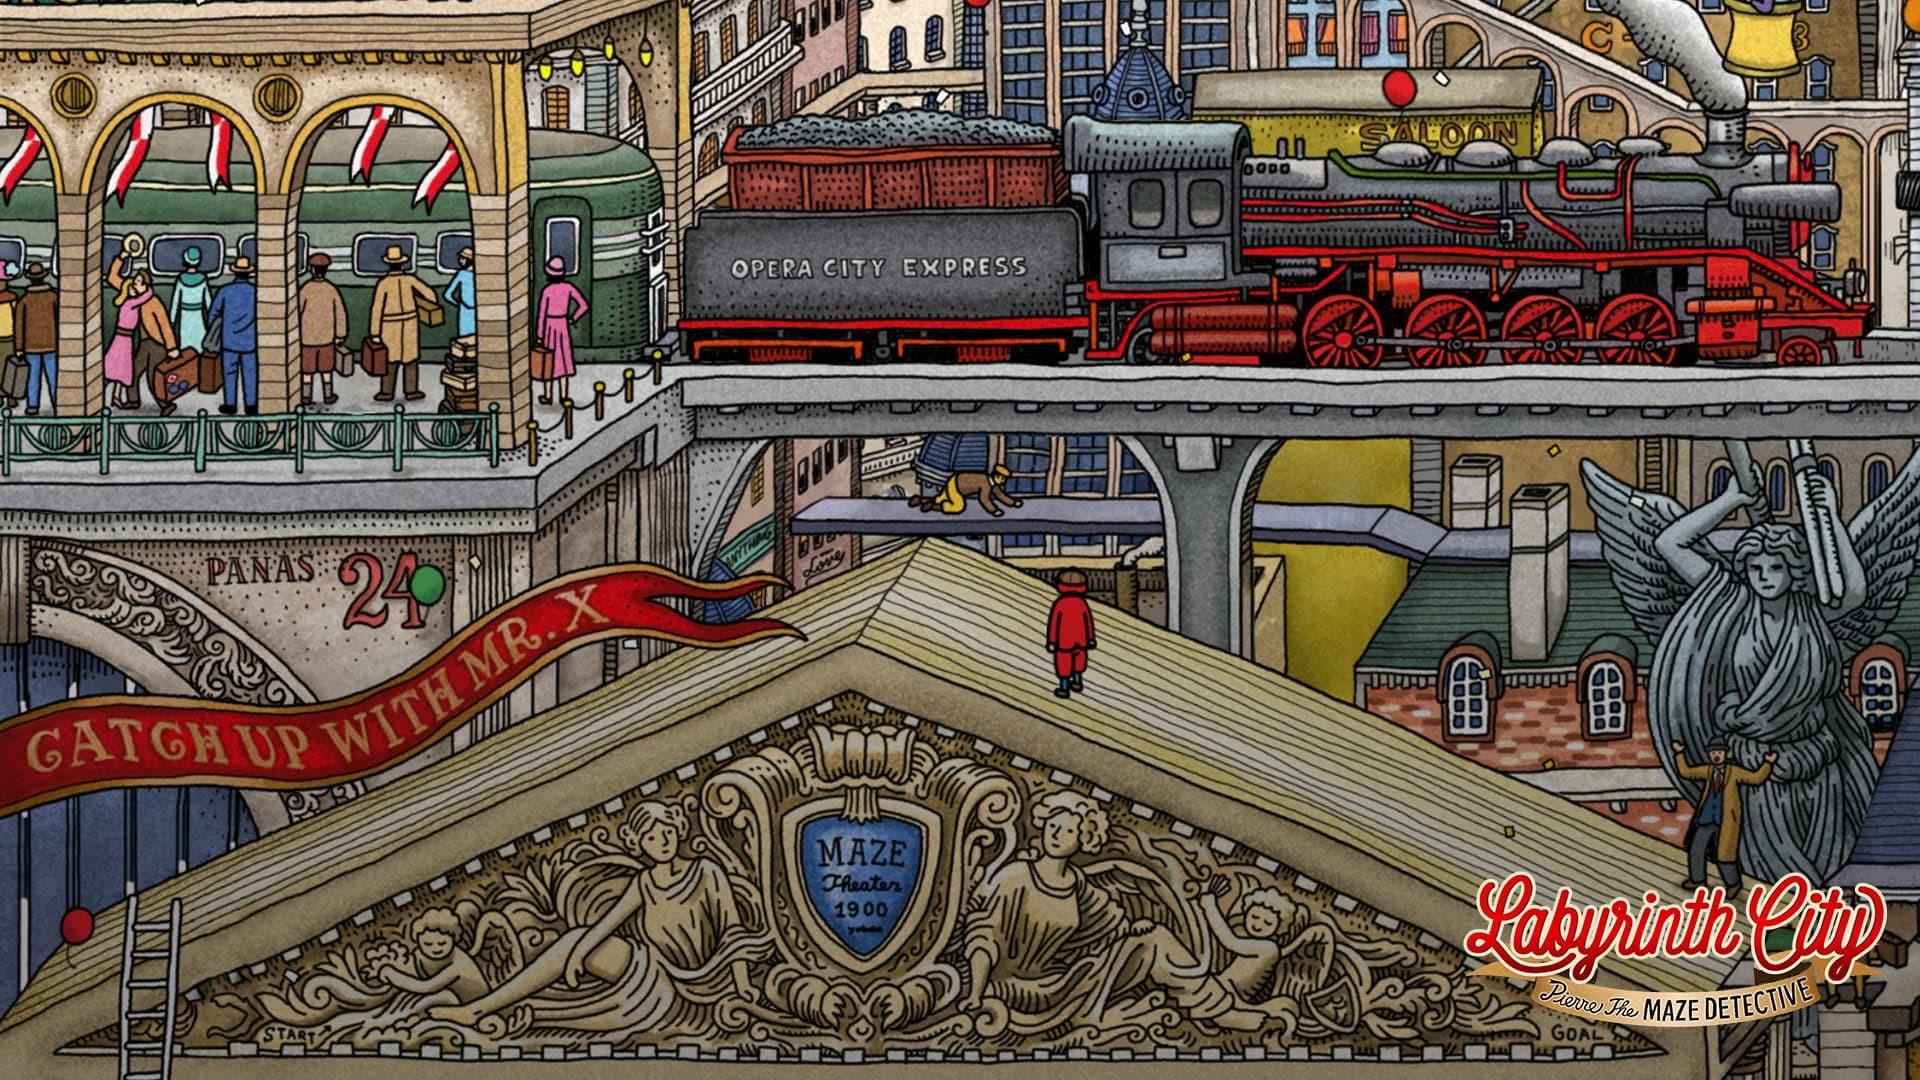 labyrinth-city-pierre-the-maze-detective-mobil-cihazlara-geliyor-2